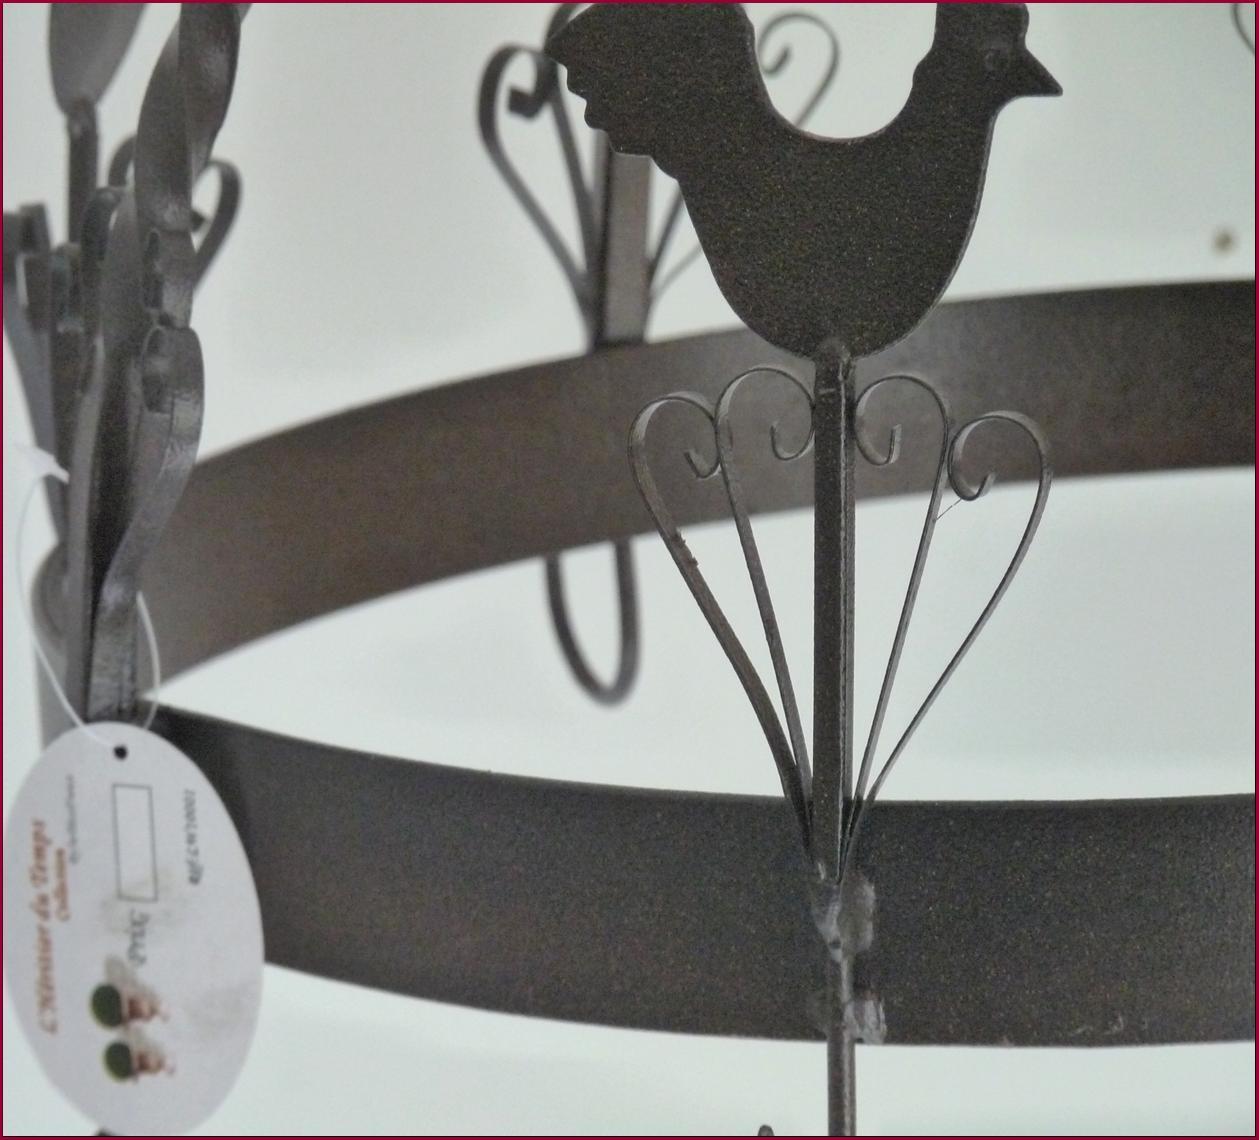 Meuble de rangement de cuisine porte jambon ustensile - Crochet ustensile cuisine ...